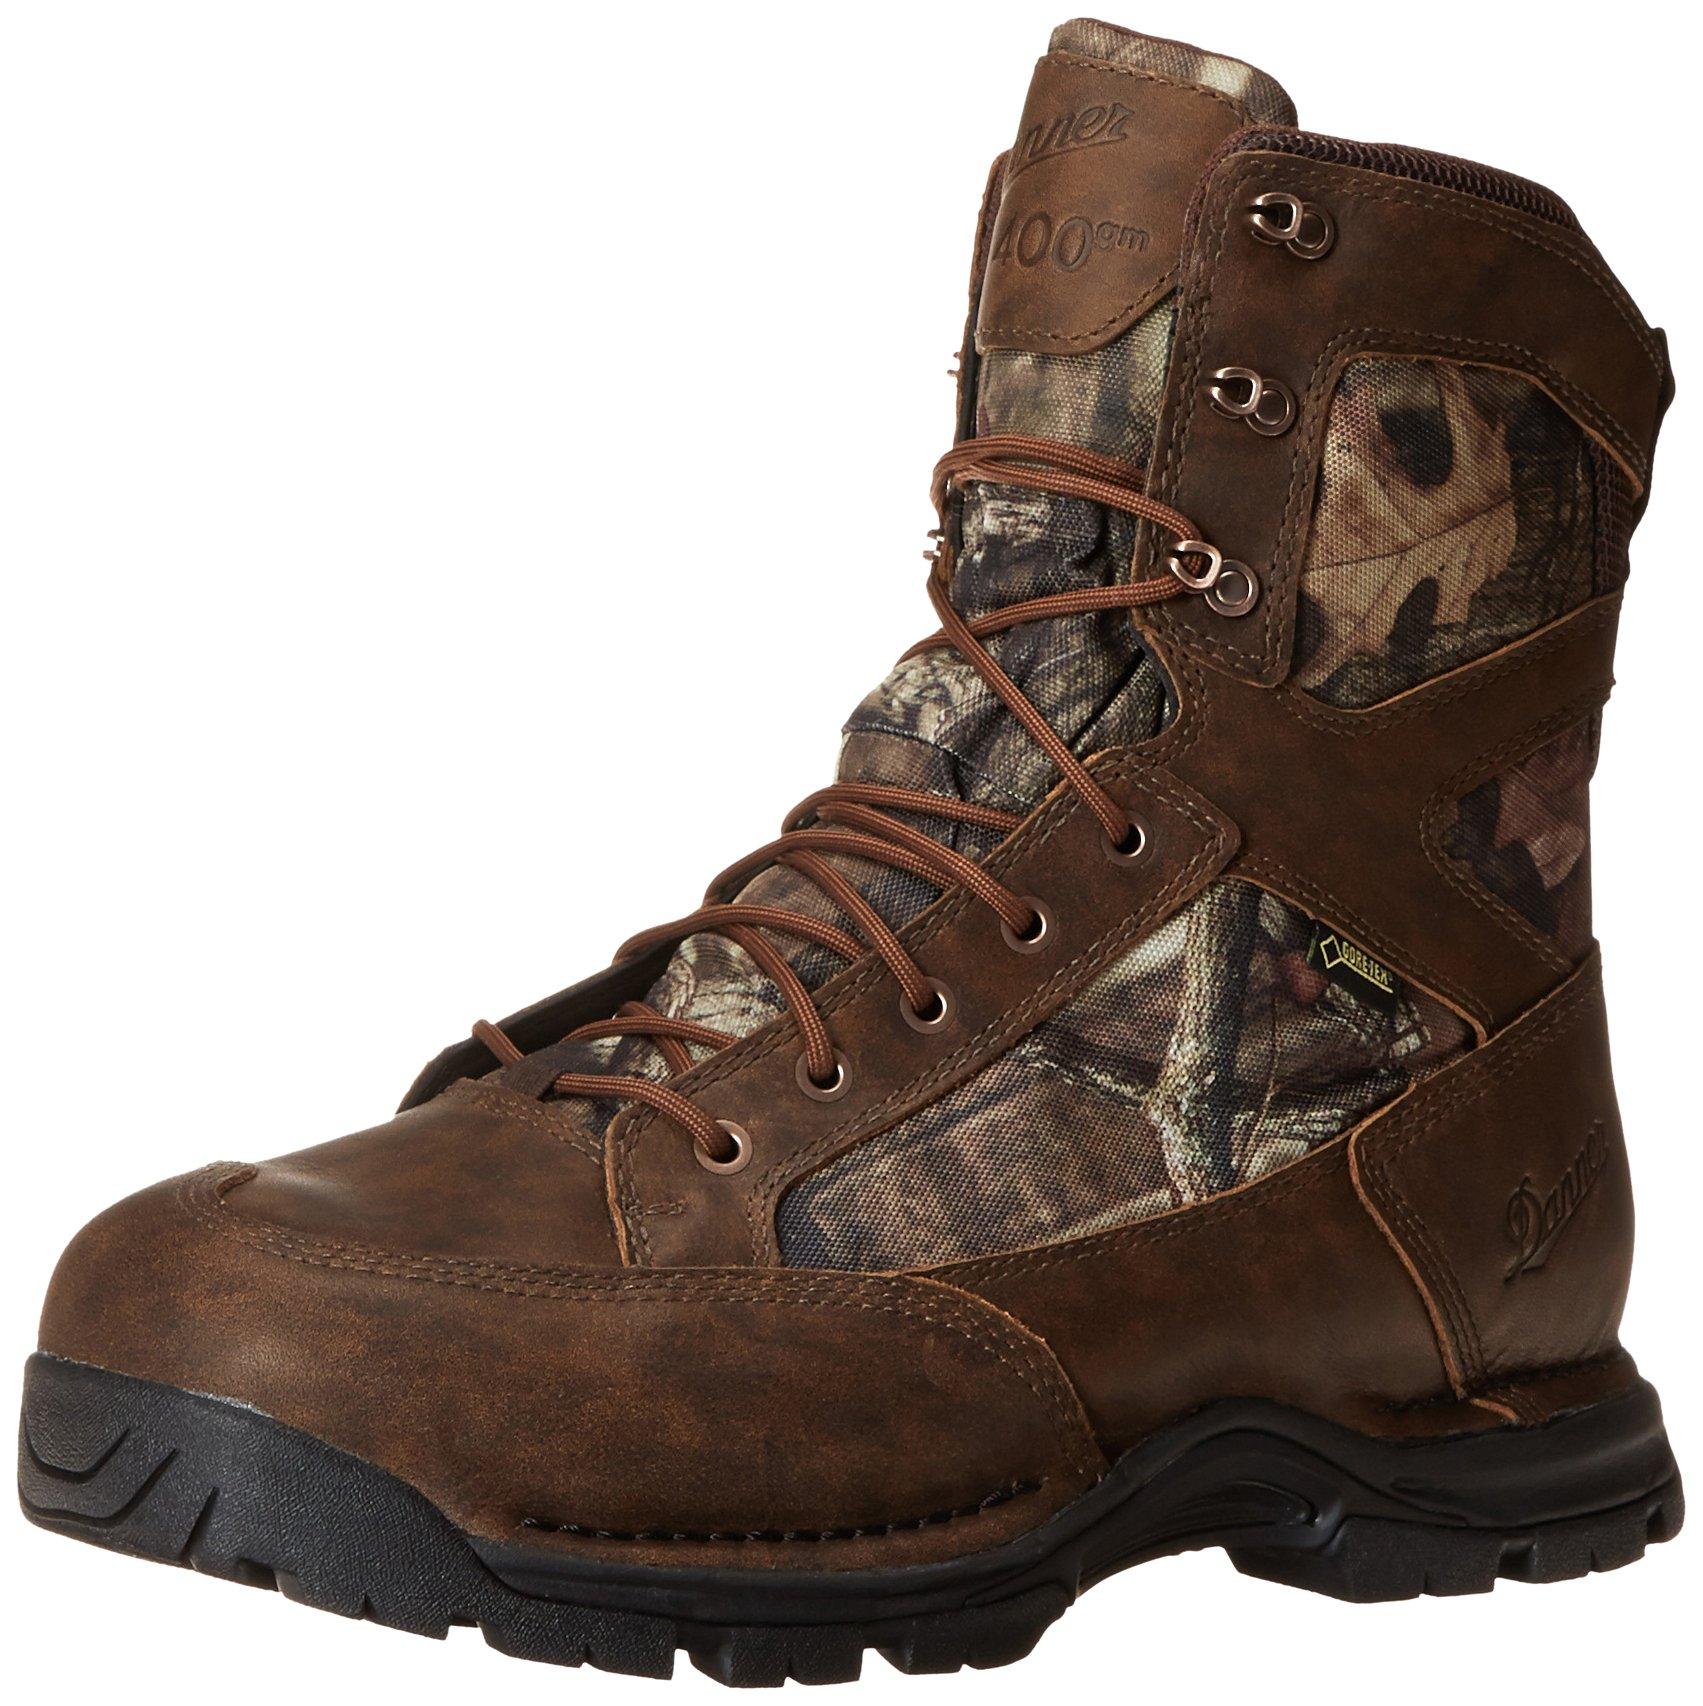 "Danner Men's Pronghorn 8"" 400G Hunting Boot,Mossy Oak Break Up Infinity,9.5 D US"